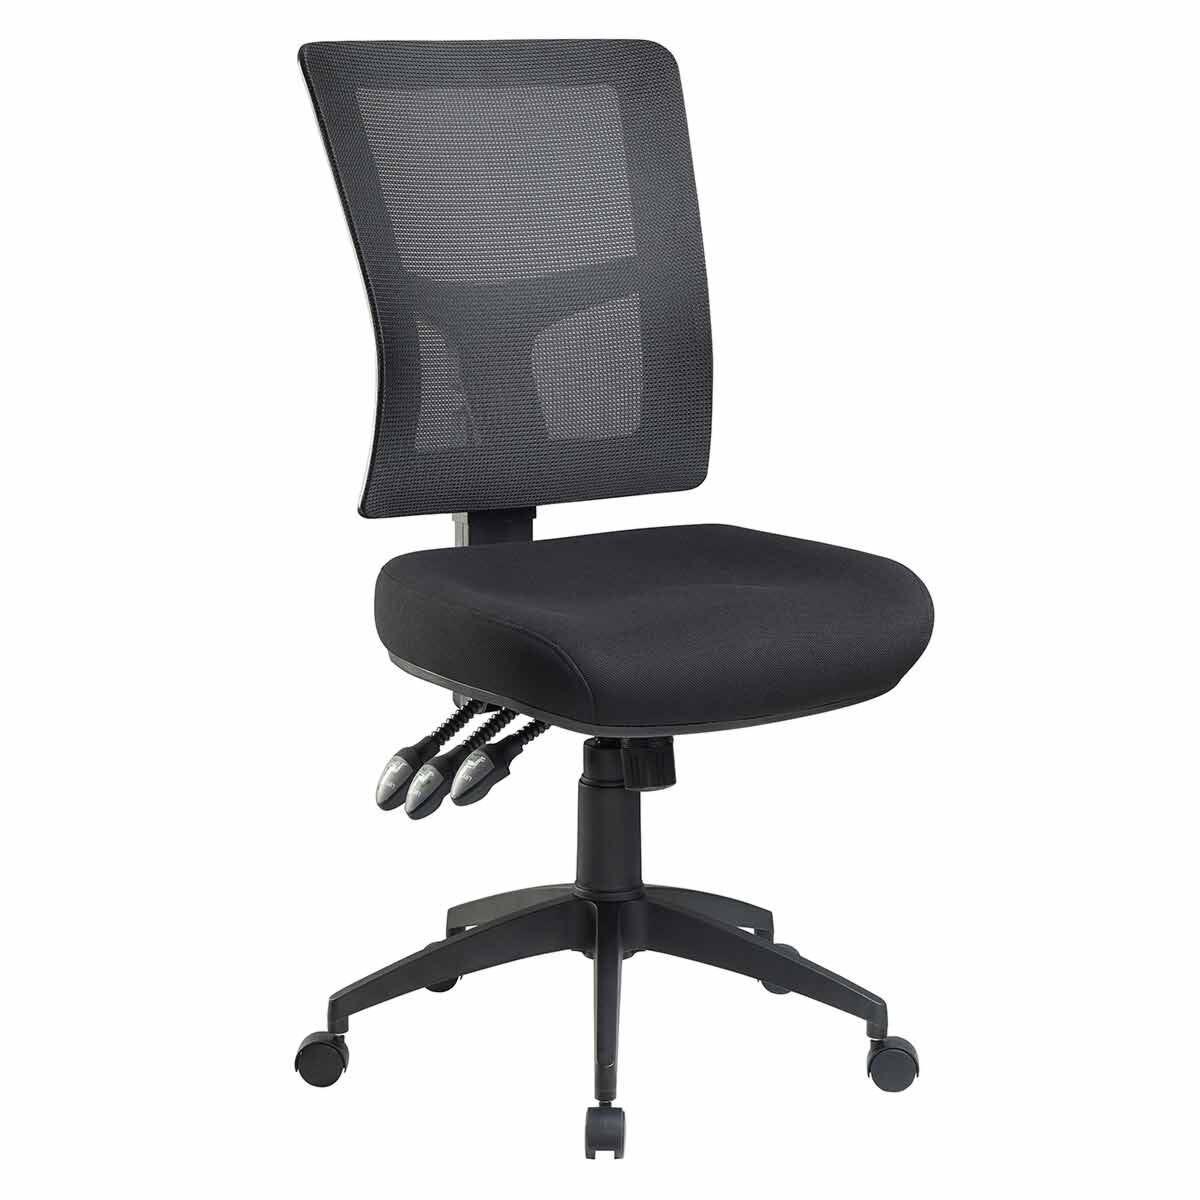 Pago Enduro Mesh Heavy Duty Ergonomic Three Lever Chair